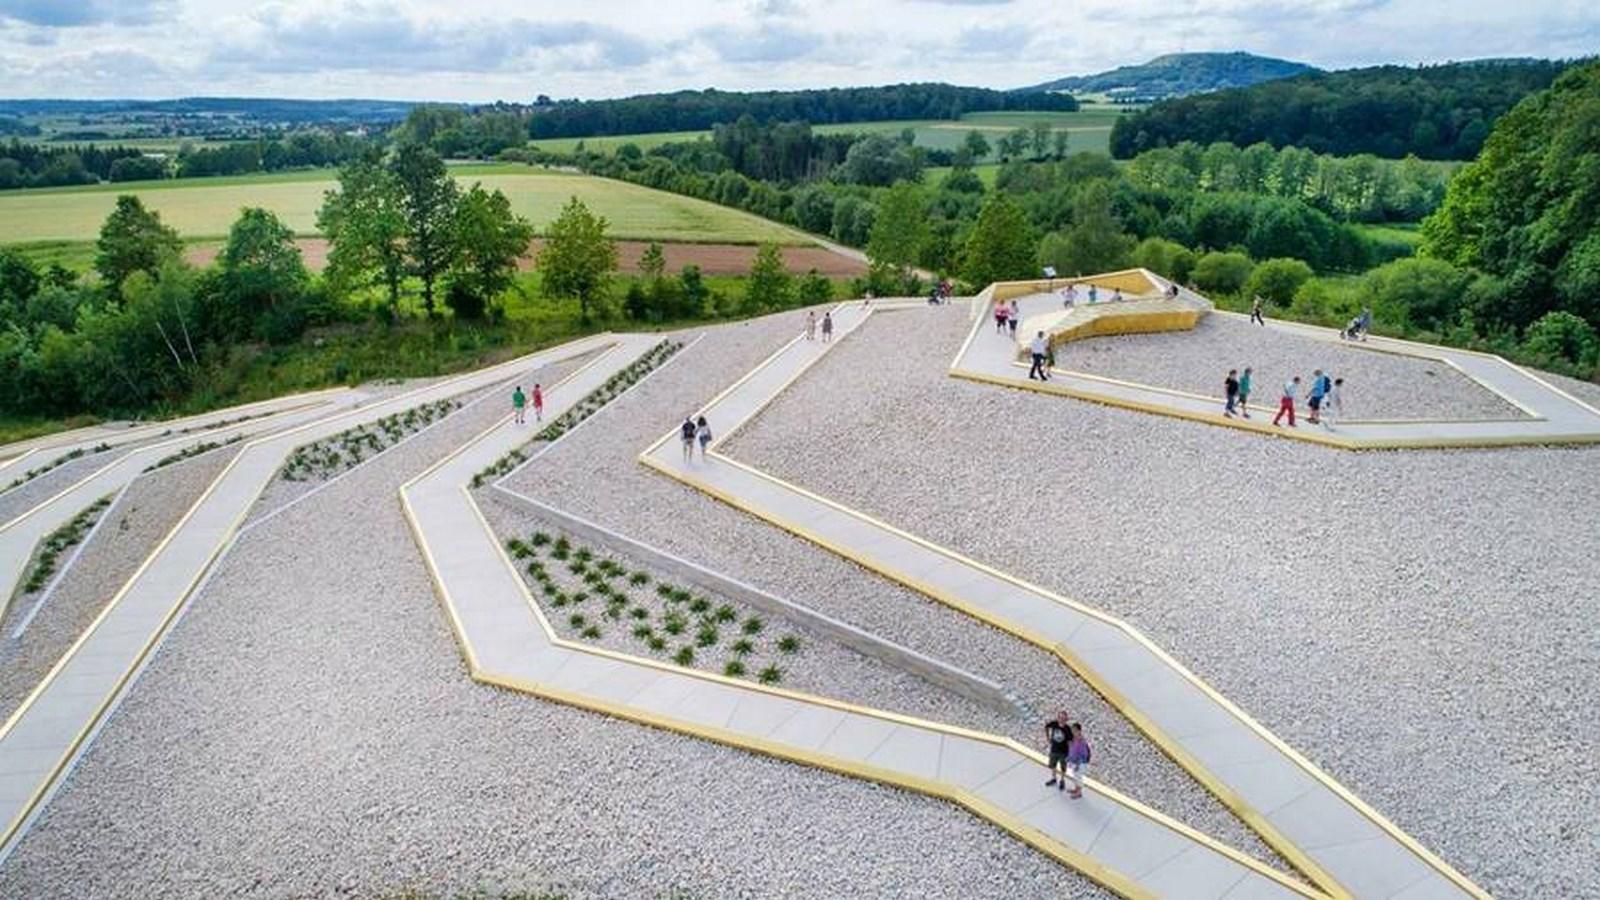 Planorama landscape architecture, Berlin, Germany - Sheet1